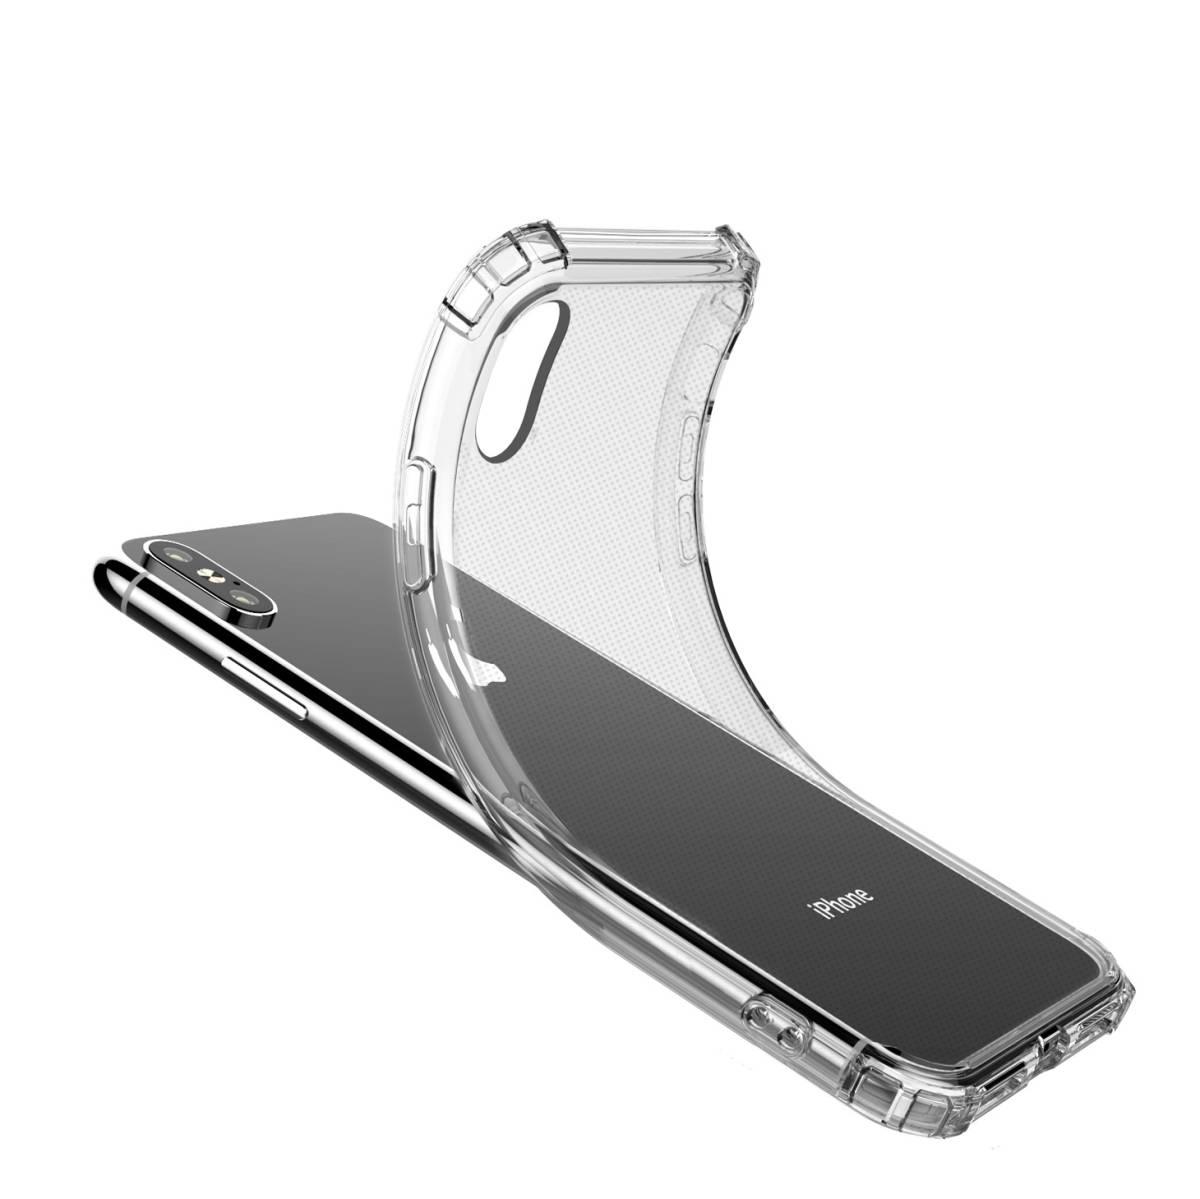 iPhone XS Max TPUケース透明ソフトクリアケース TPU 耐衝撃 衝撃吸収 ストラップホール付き 全面保護カバー 傷つけ防止_画像5